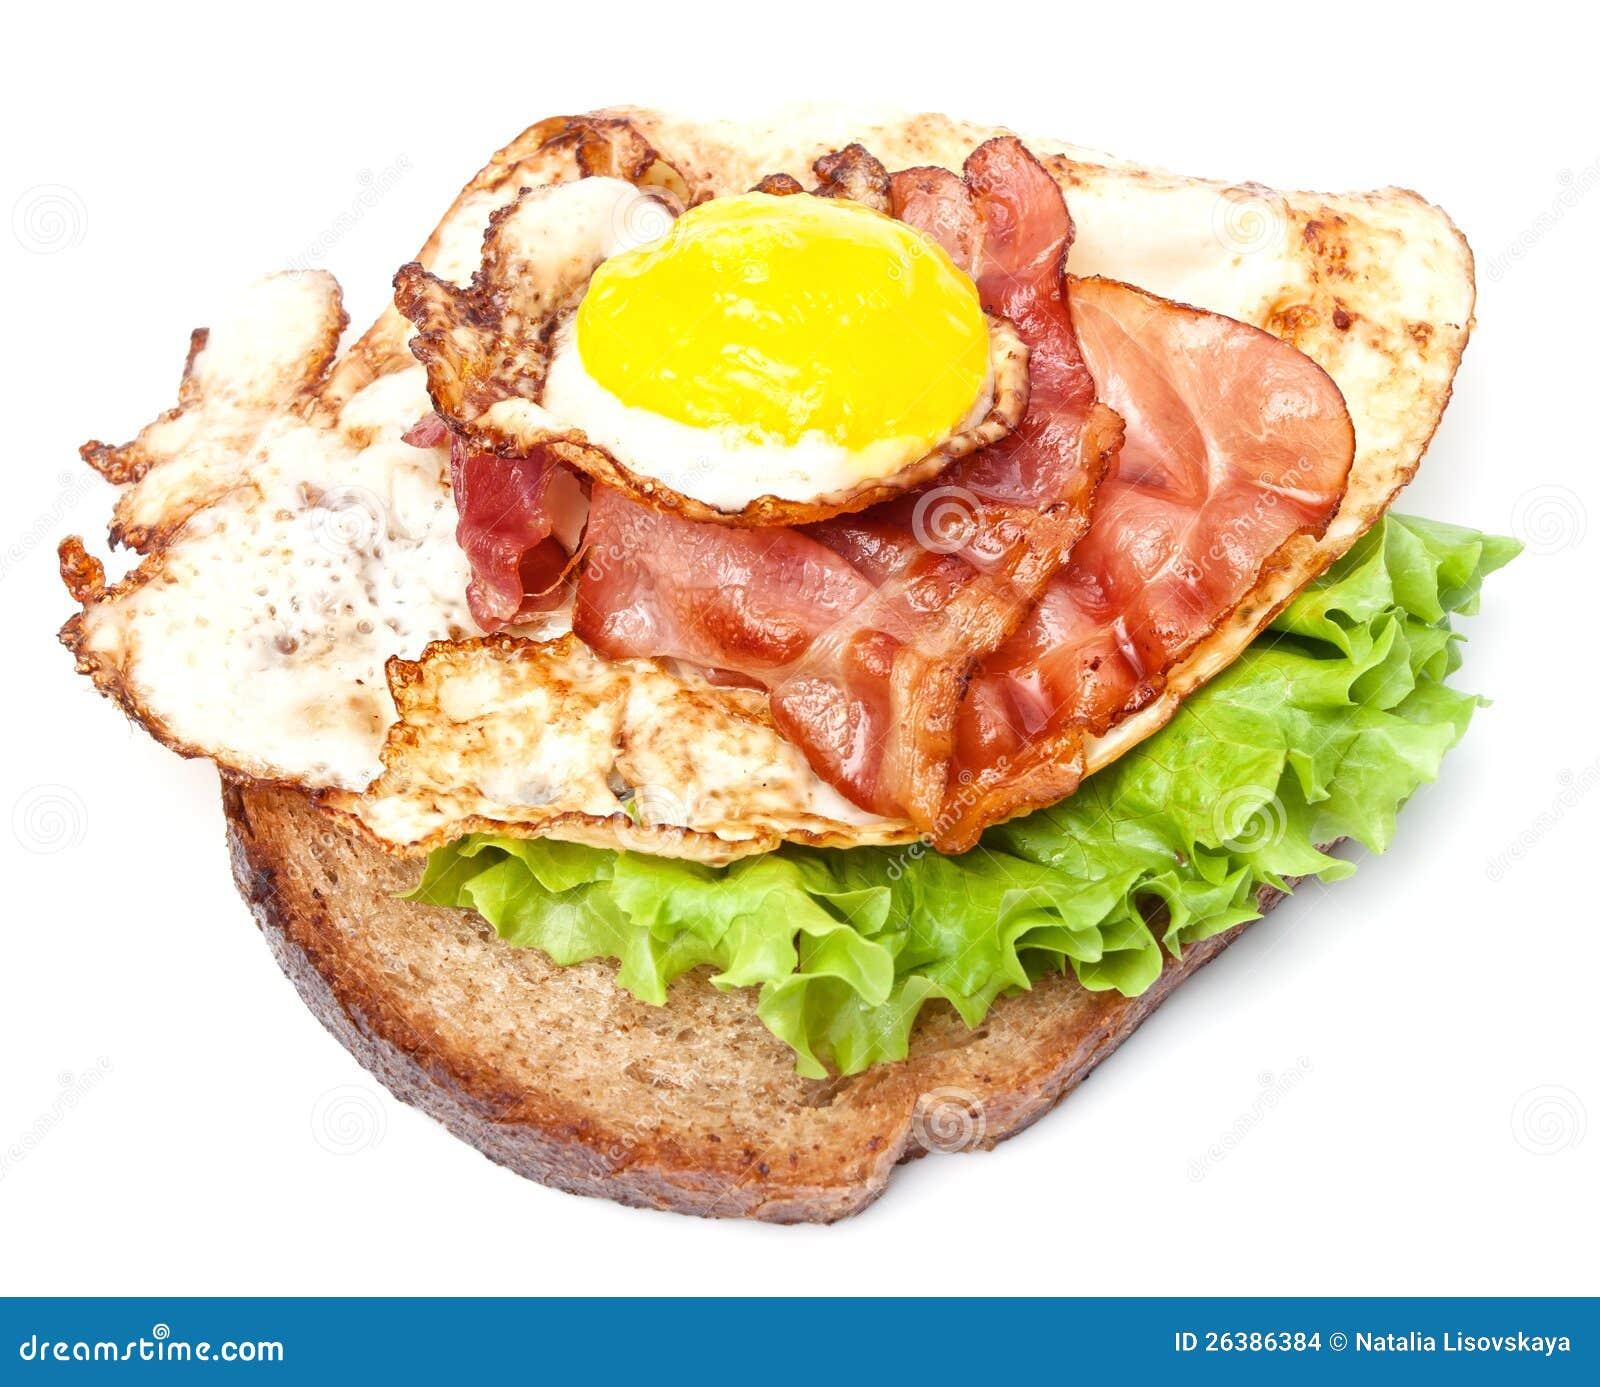 Sanduíche com ovo e bacon